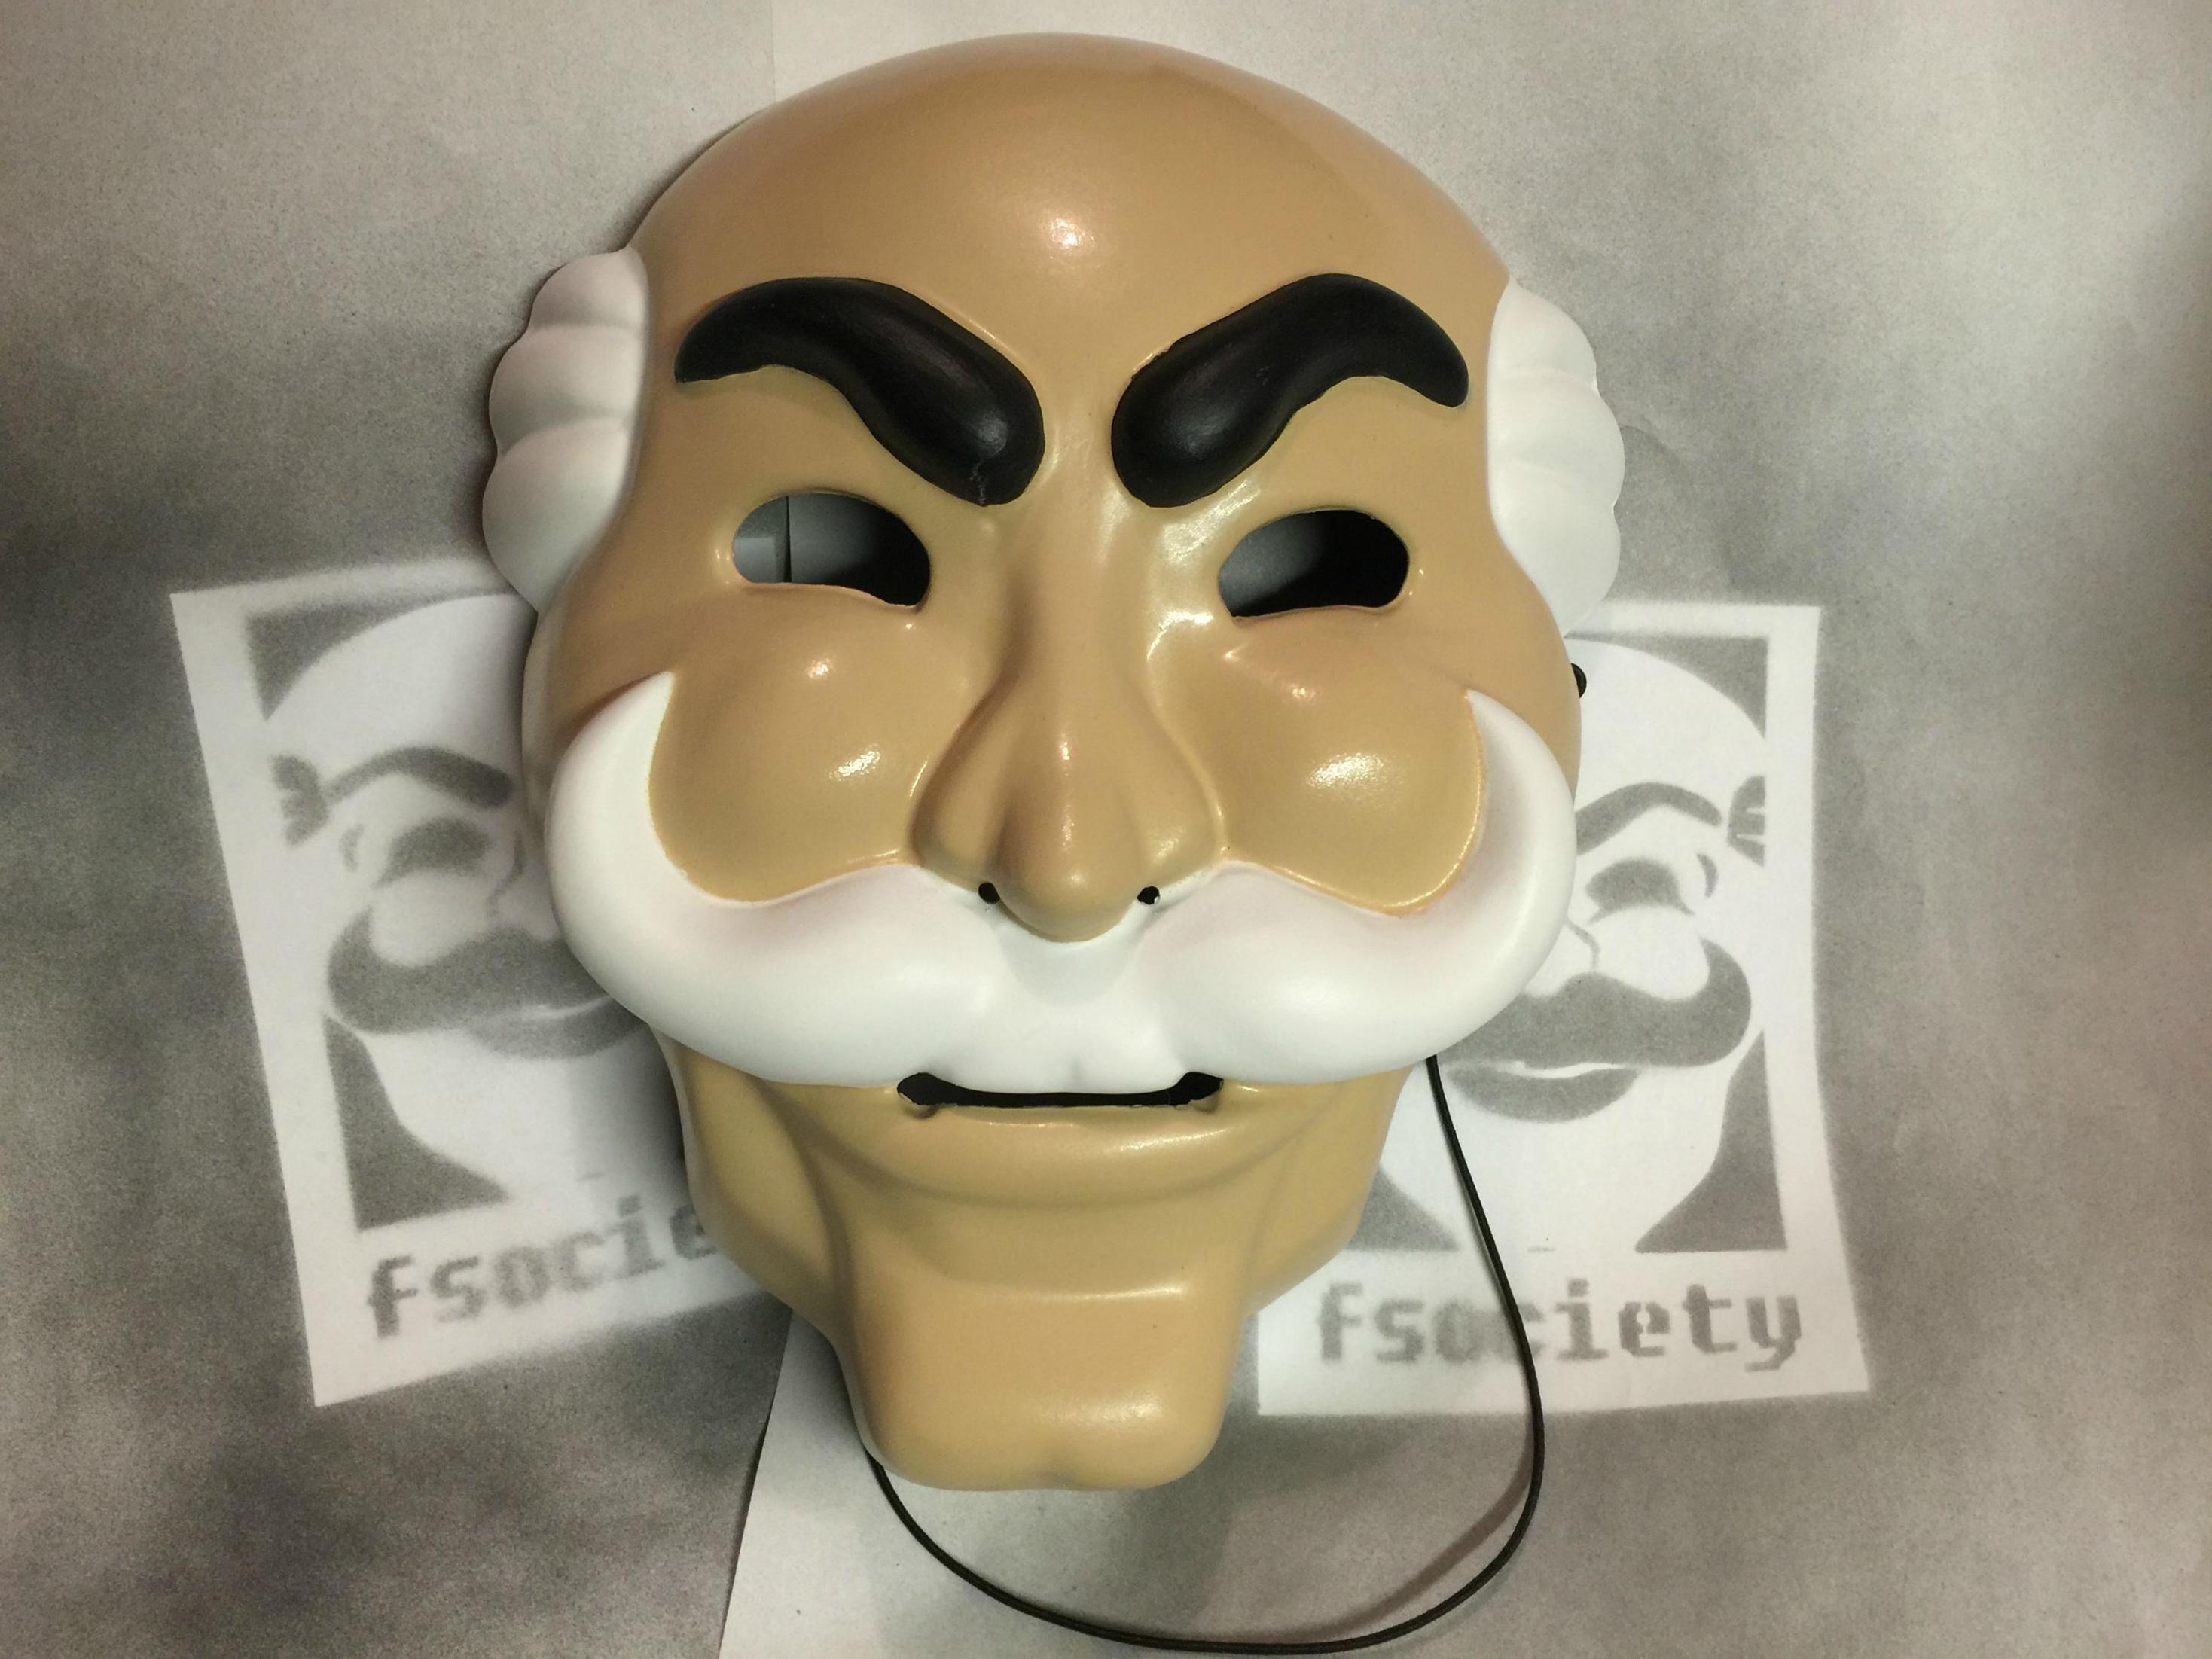 Mr. Robot Mask | Project: Mr Robot | Pinterest | Mr robot and Robot